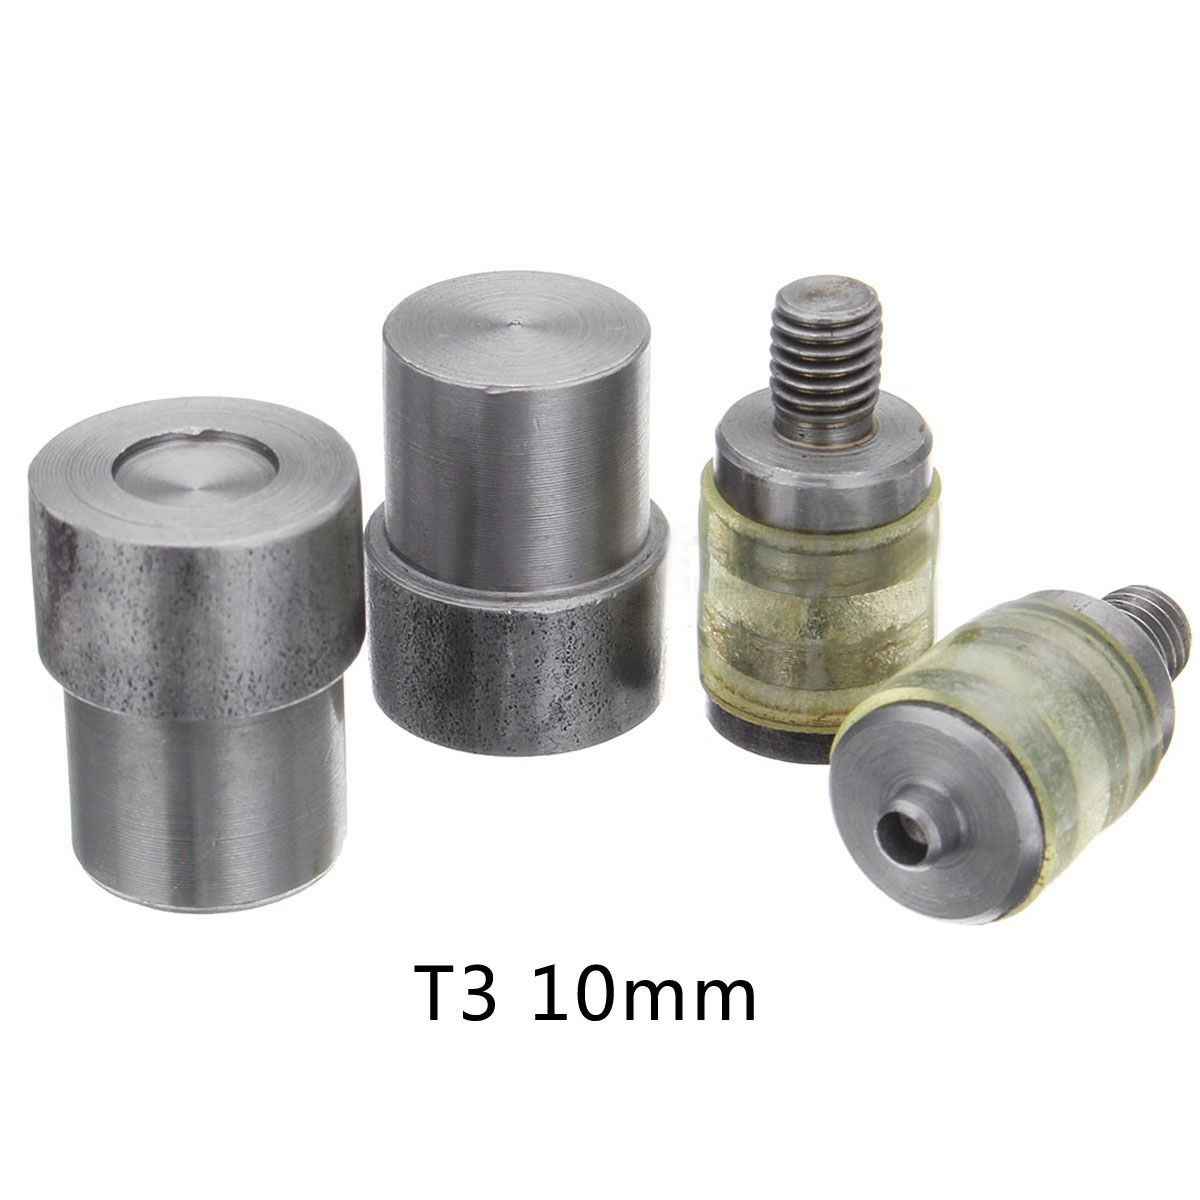 9.5-15mm Manual Claw Clasp Snap Fastener Dies Hand Pressure Pressing Clamp Machine Tool Diy